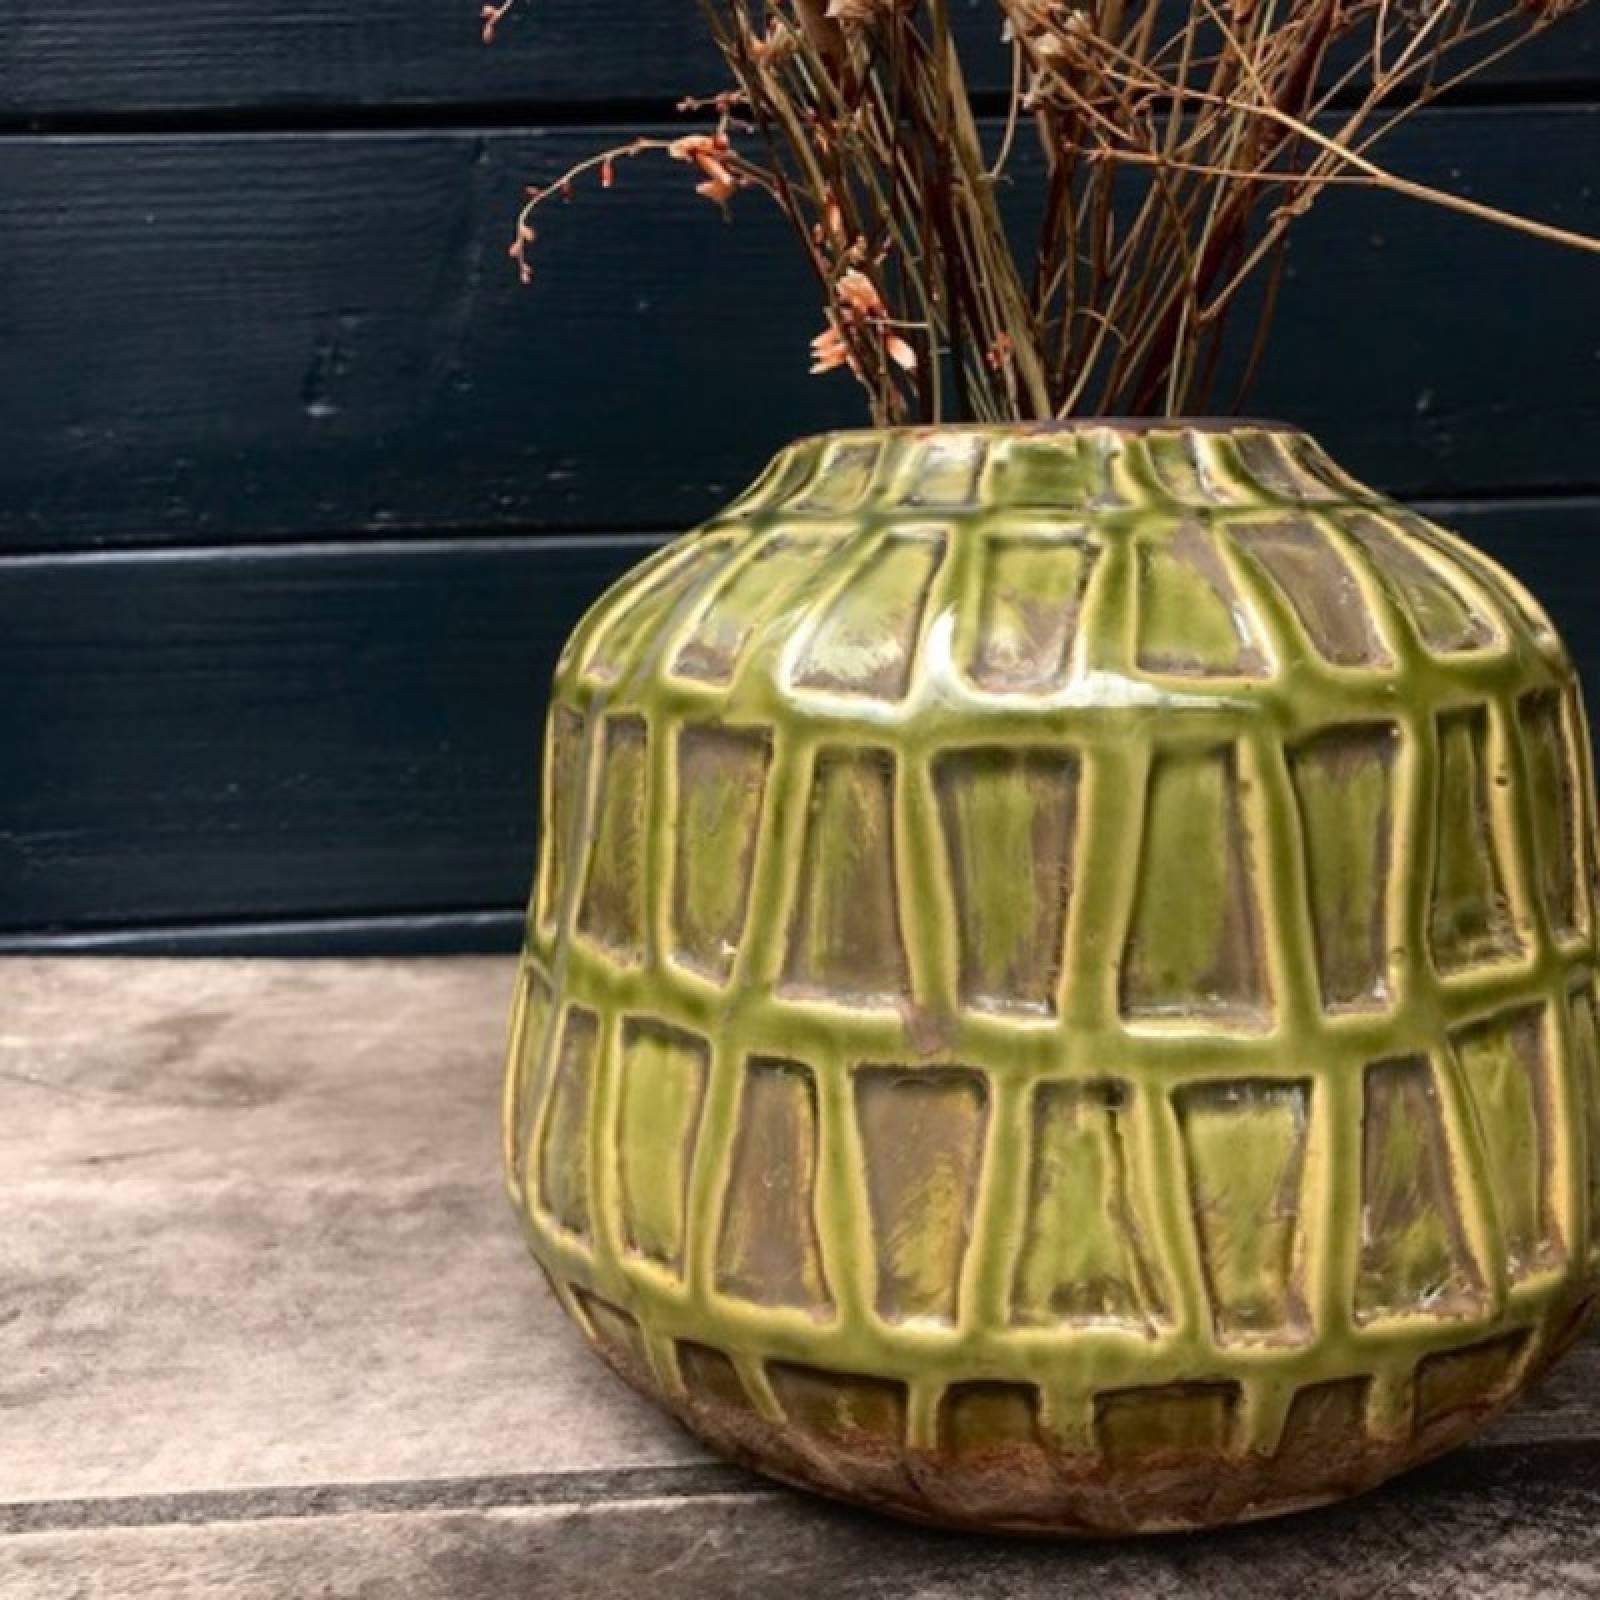 Green Deco Vase 16.5 x 19.5cm thumbnails